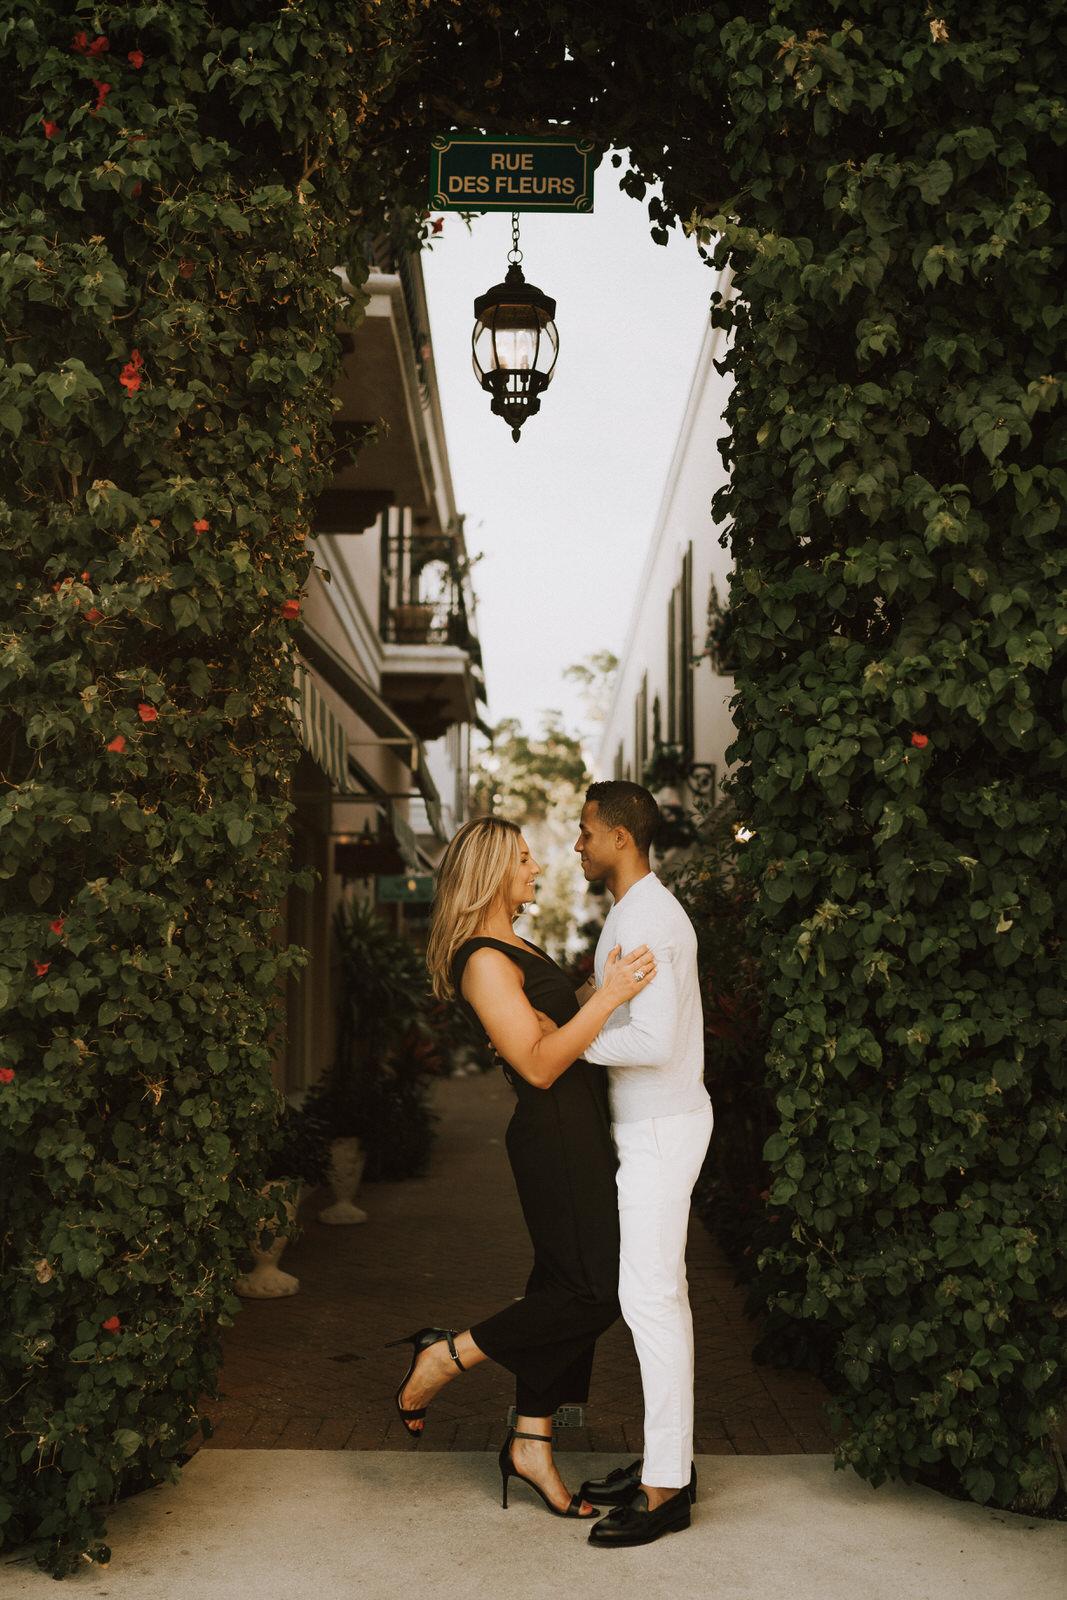 Naples 5th Ave Engagement Photos- Michelle Gonzalez Photography- Michele + Troy-186.JPG